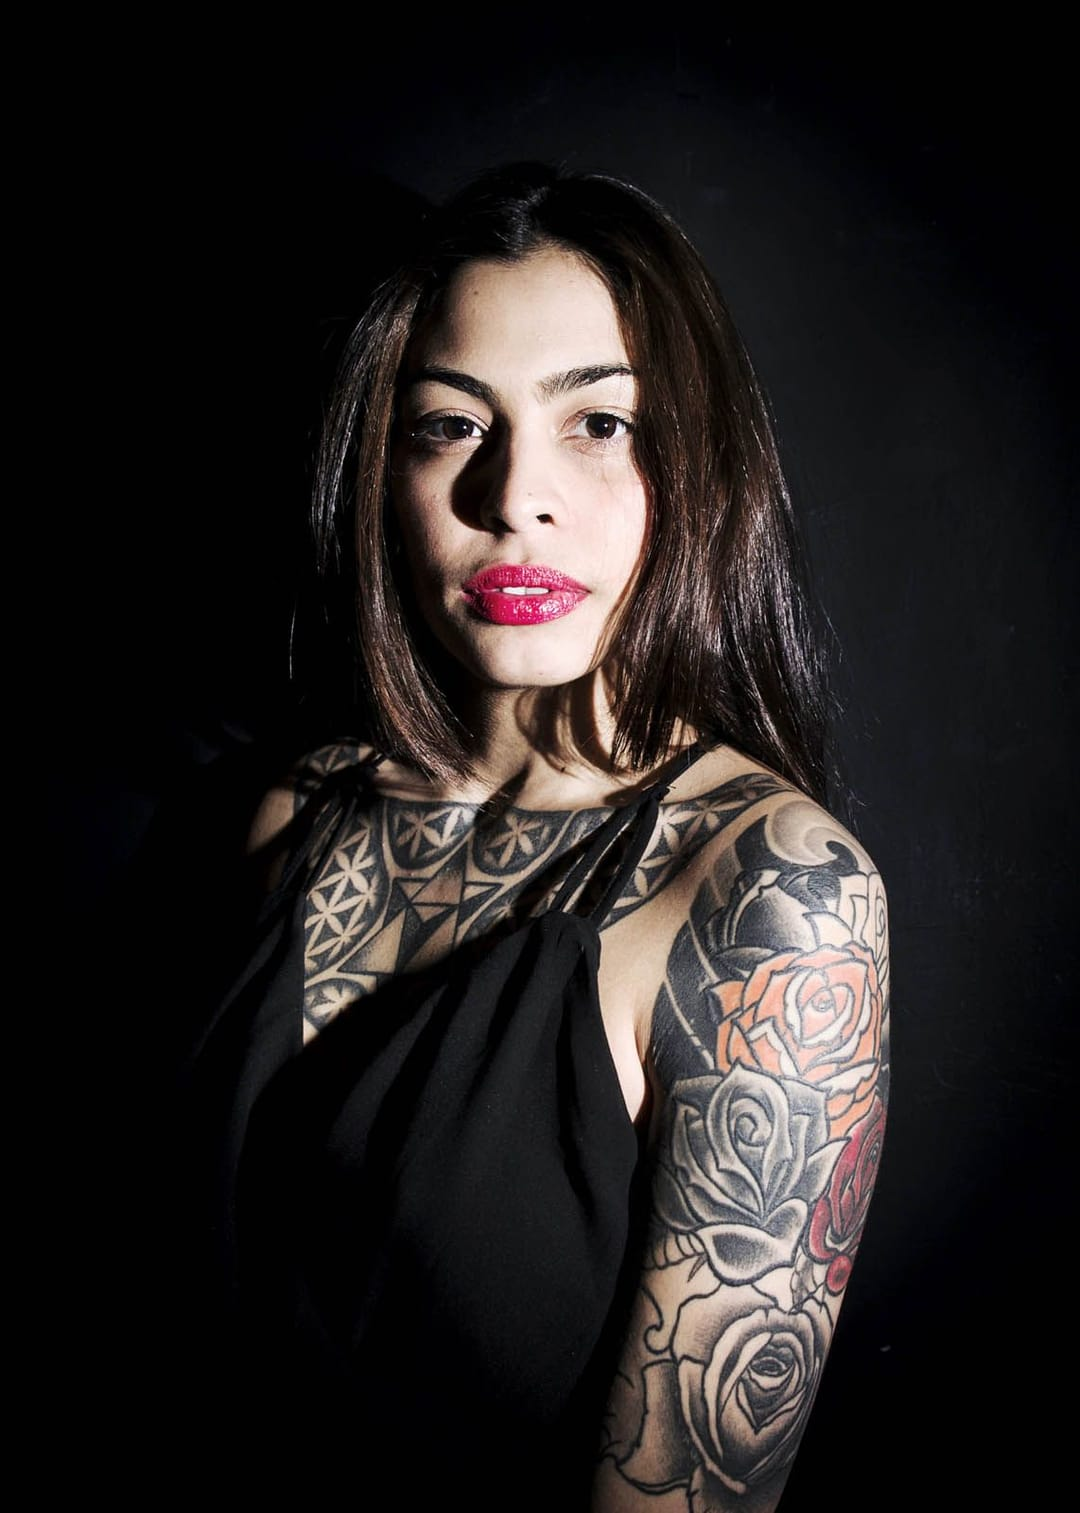 Niasia, 20, Tattoo Artist